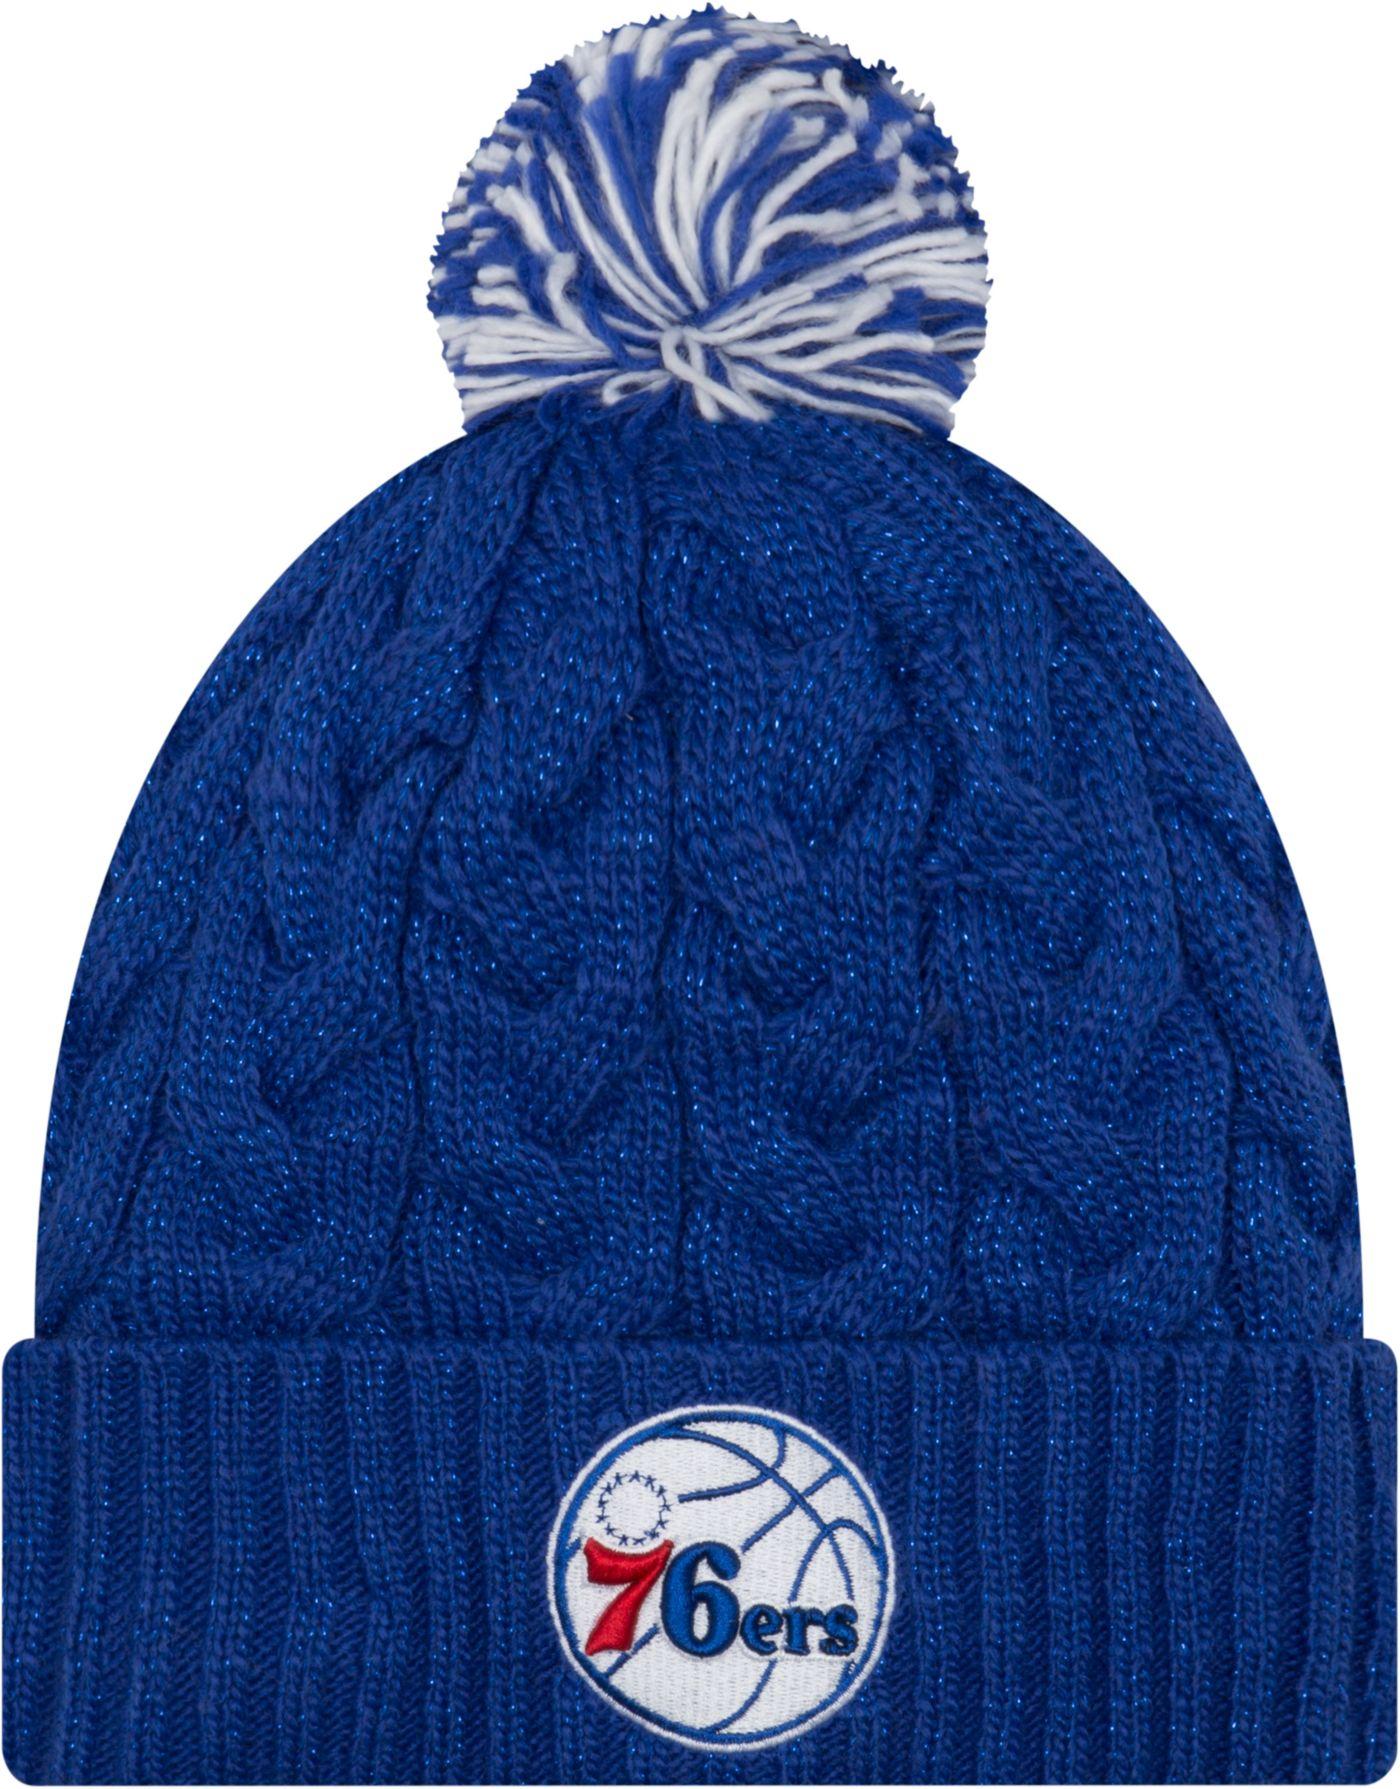 New Era Women's Philadelphia 76ers Cozy Knit Hat